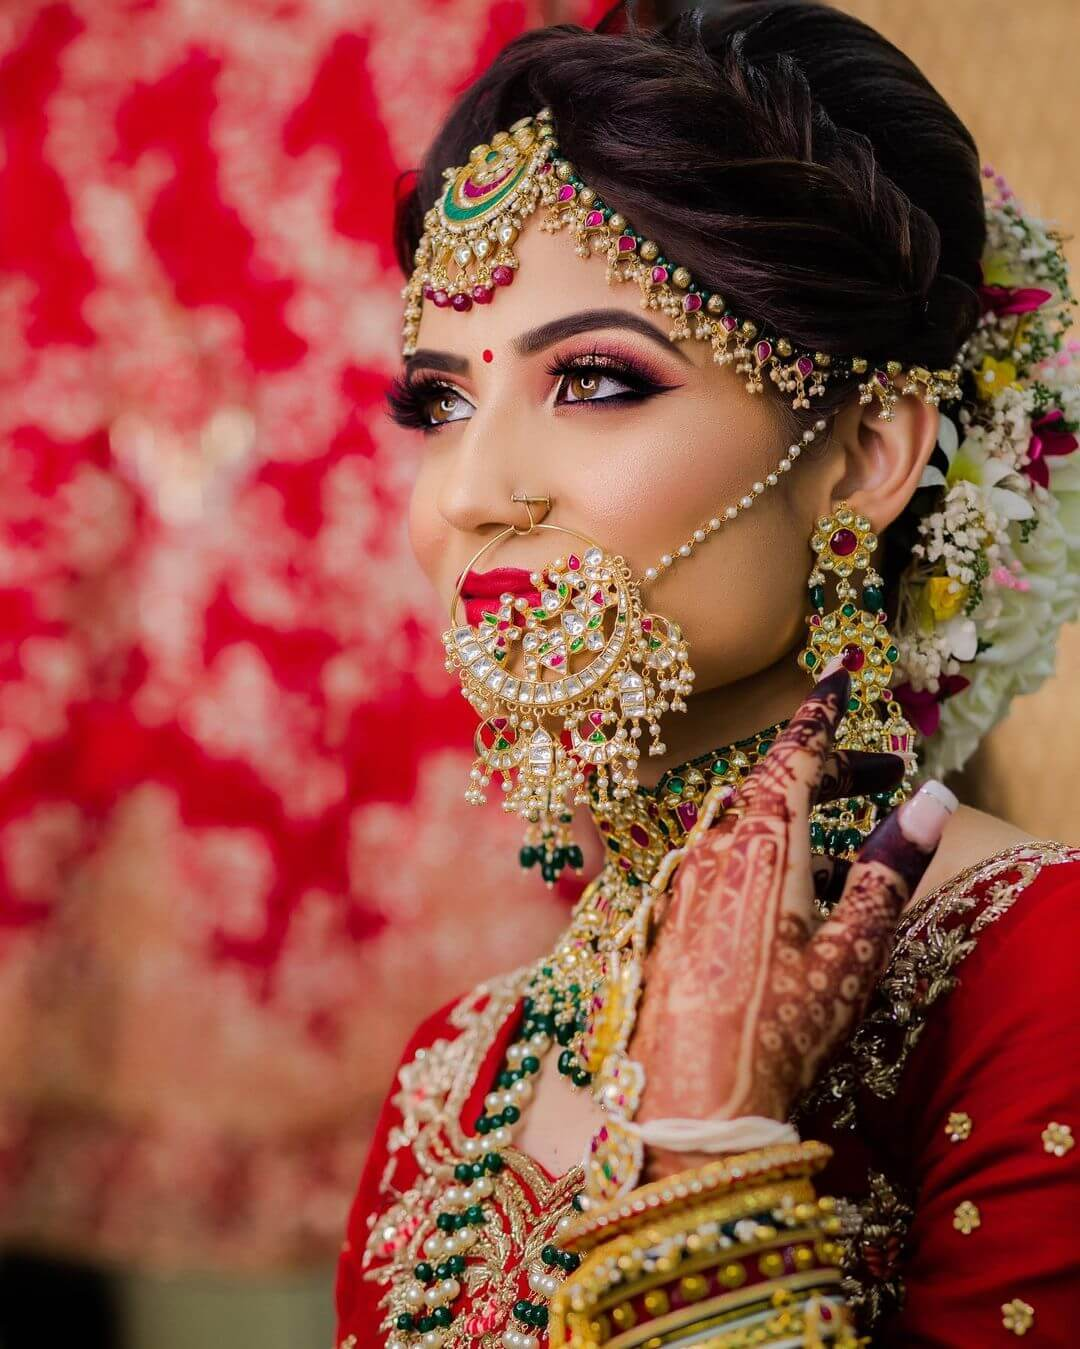 The Dreamy heavy nath, neckpiece bridal Look - traditional Gujarati bridal makeup looks